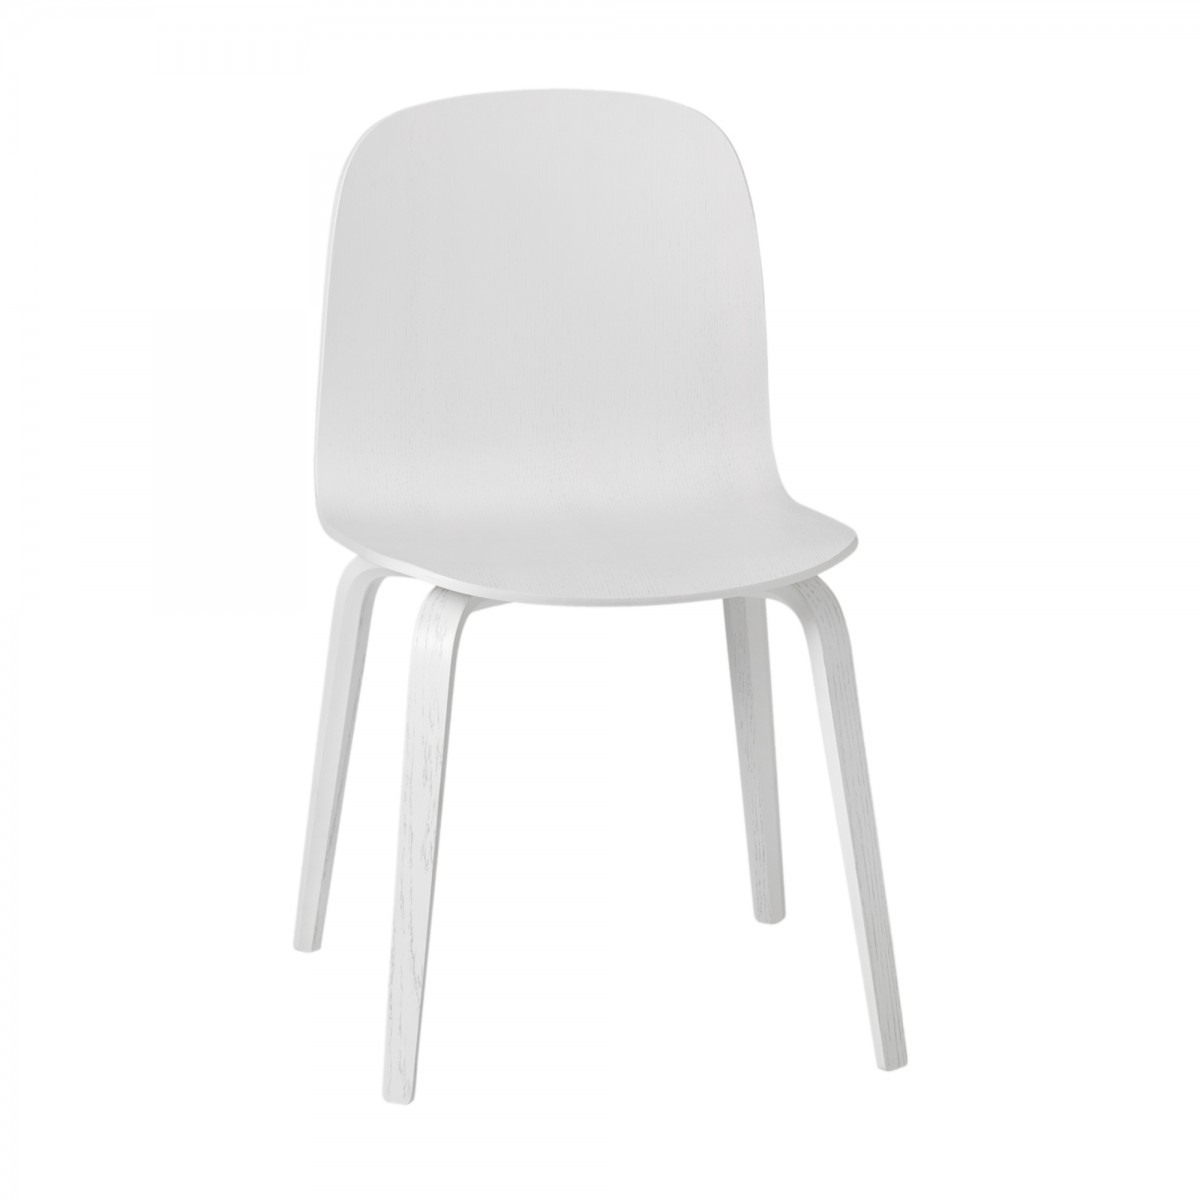 chaise visu blanc pieds bois muuto. Black Bedroom Furniture Sets. Home Design Ideas